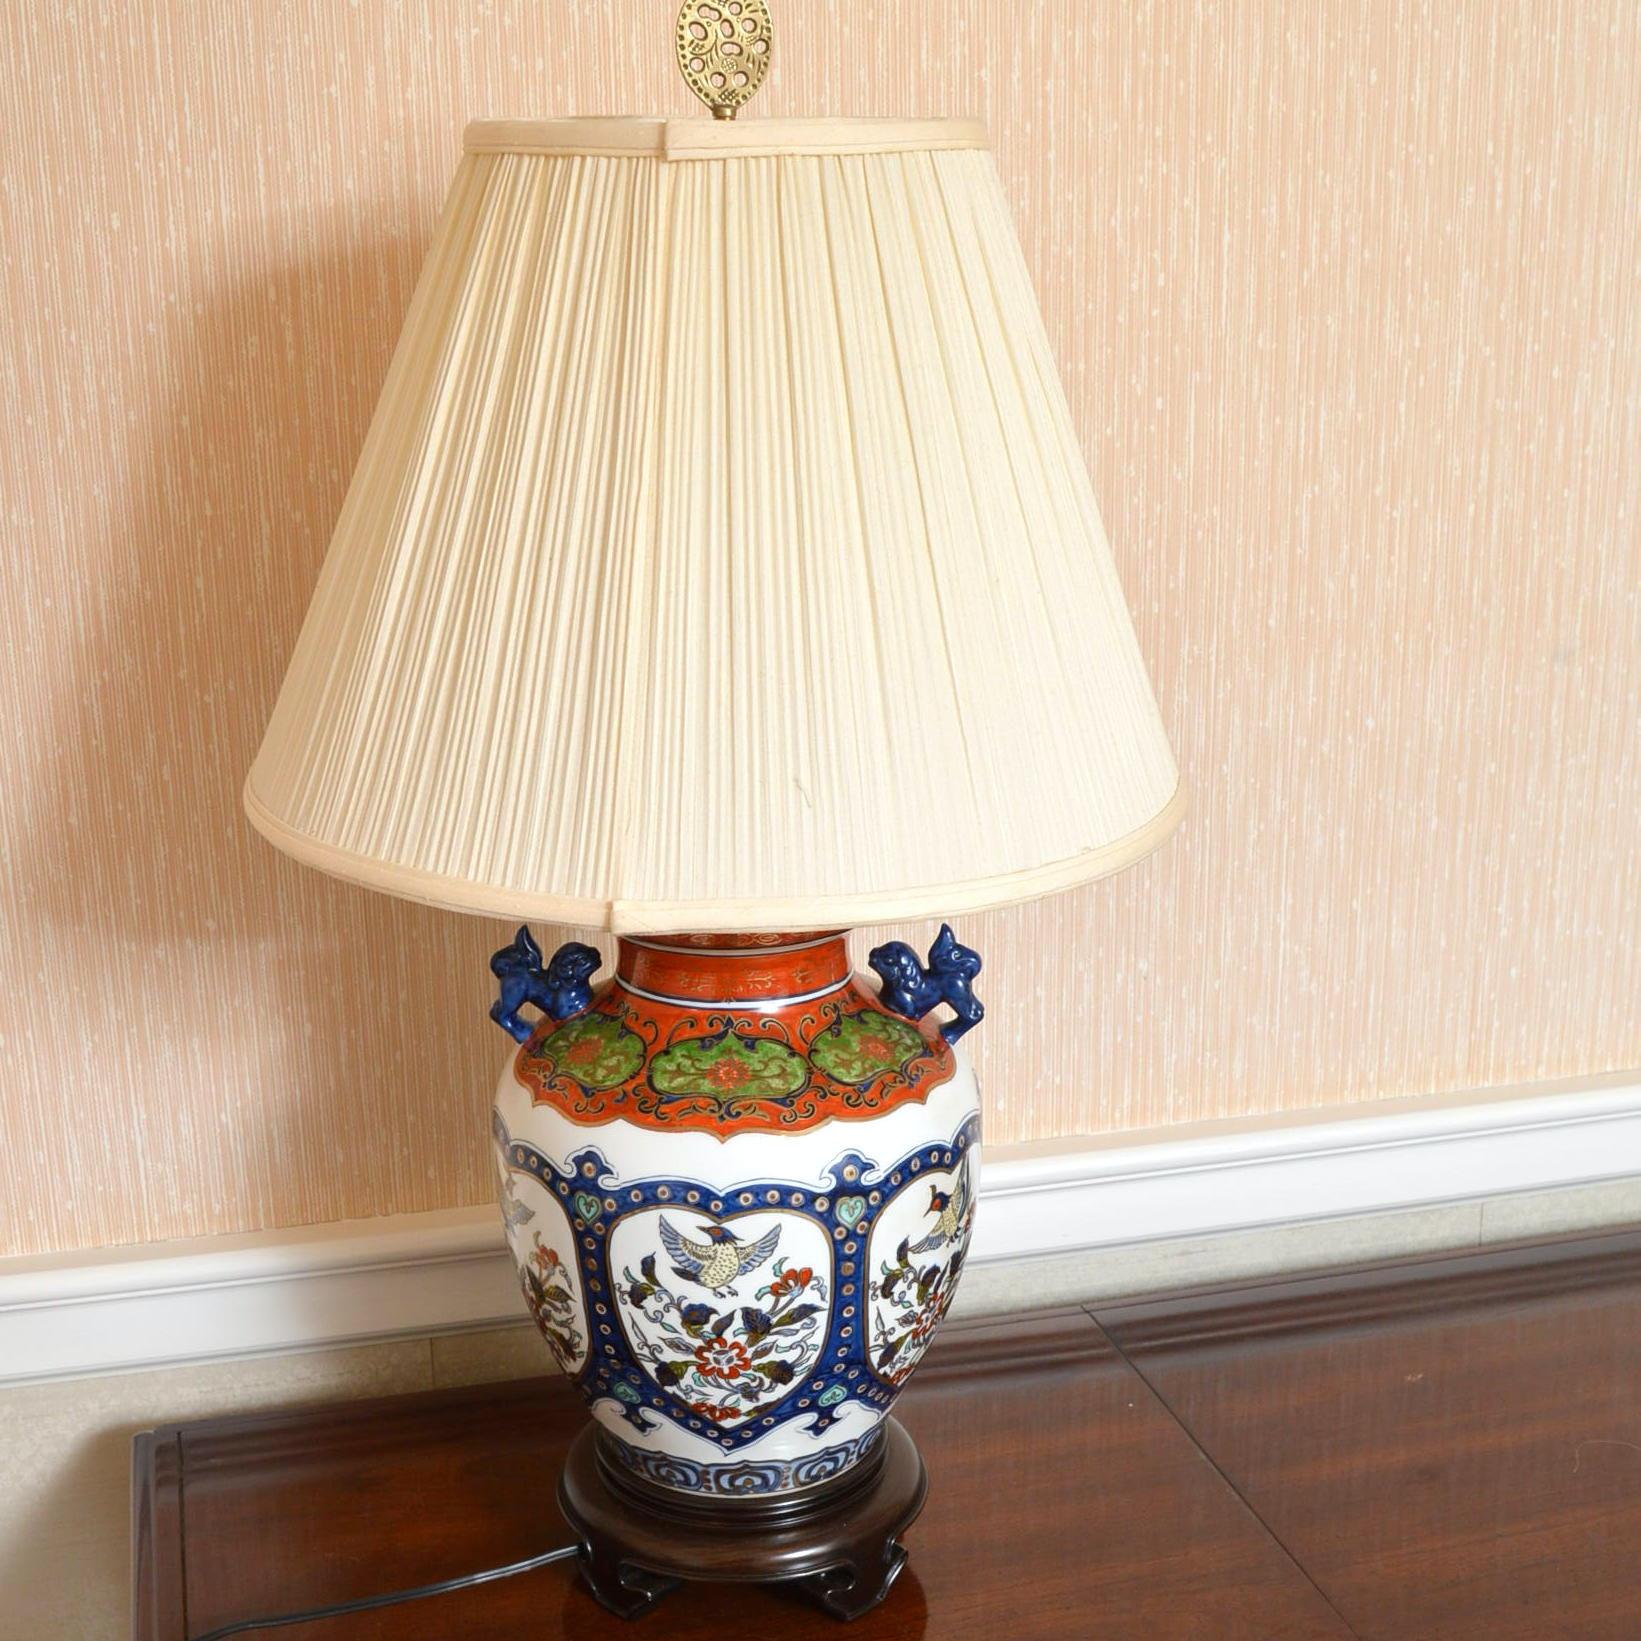 East Asian Style Porcelain Vase Table Lamp